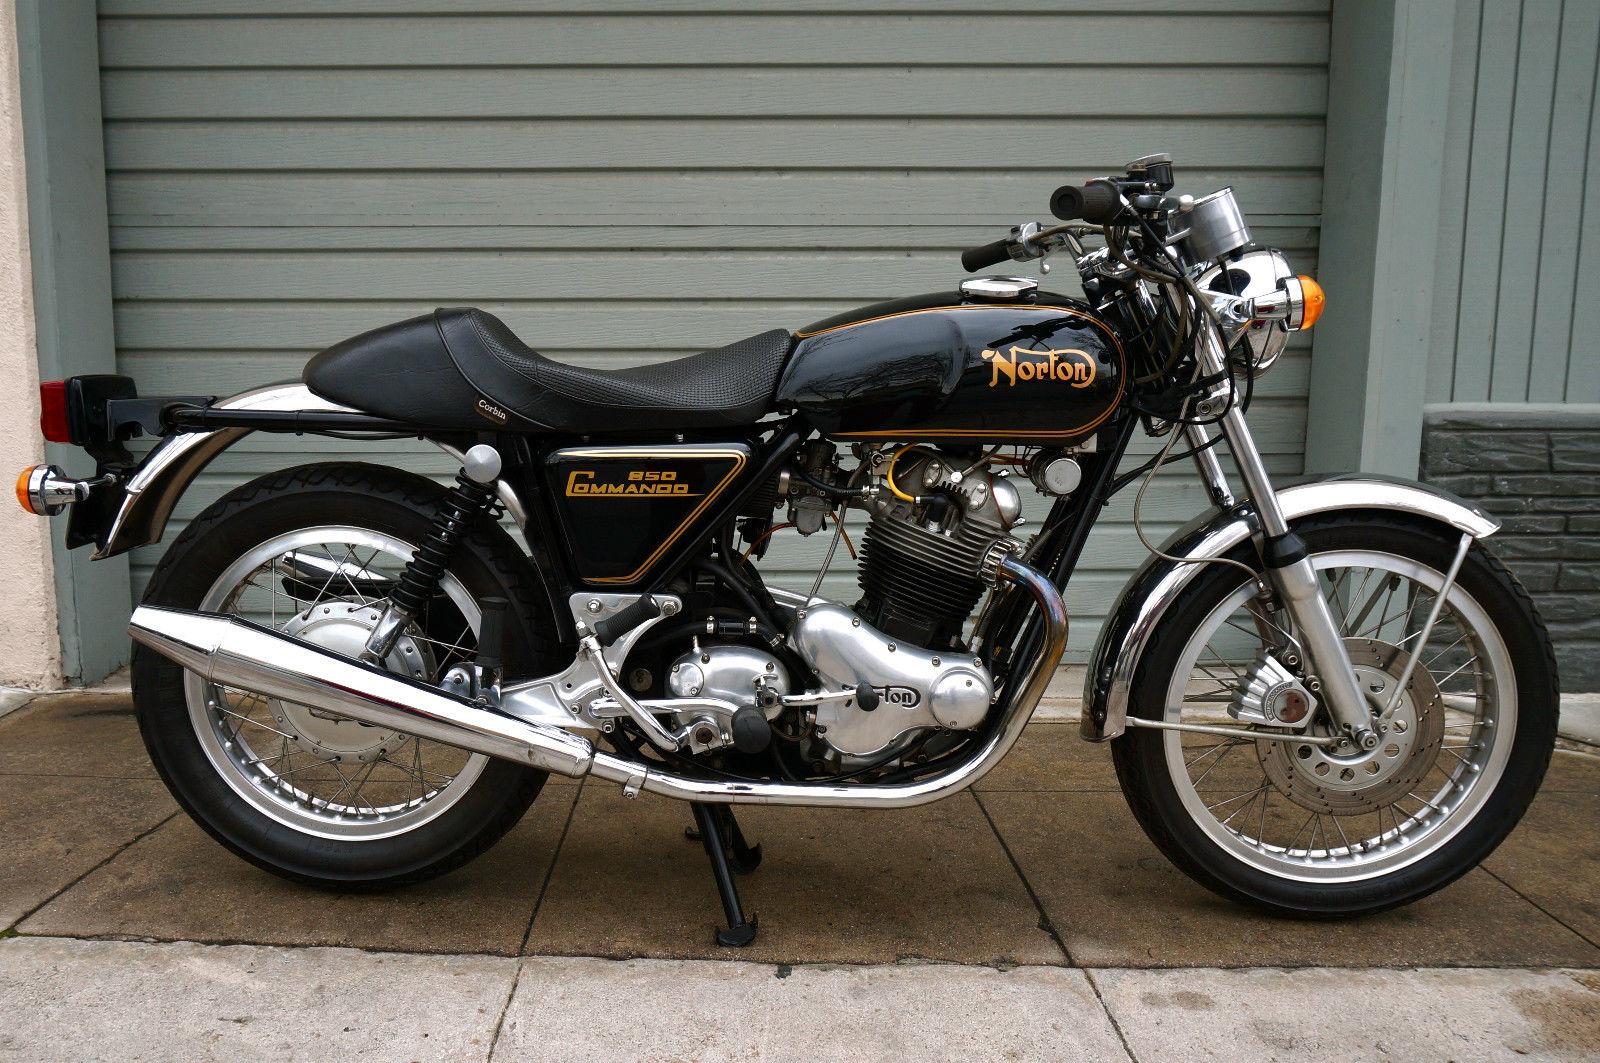 850 Norton Wiring Diagram Trusted 1973 Commando Hobbiesxstyle Mallory